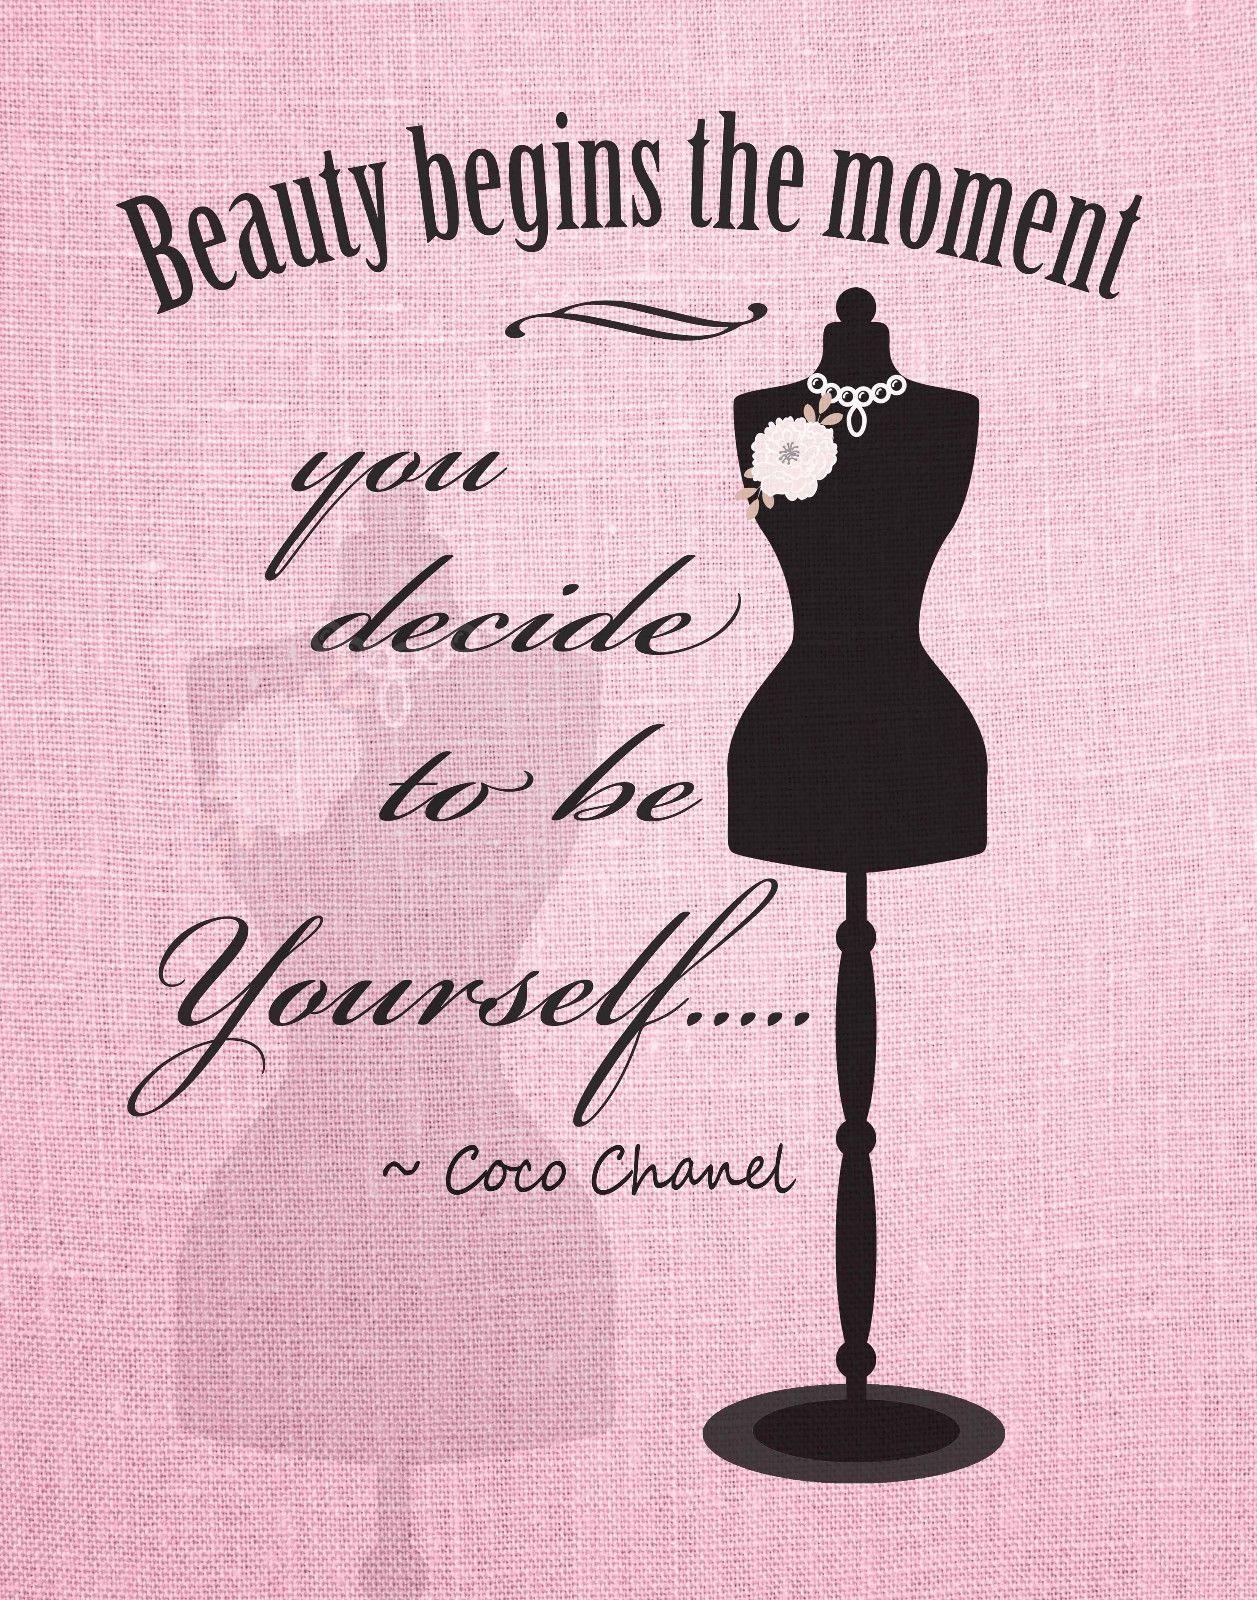 Details about Women's Beauty Fashion Art Print